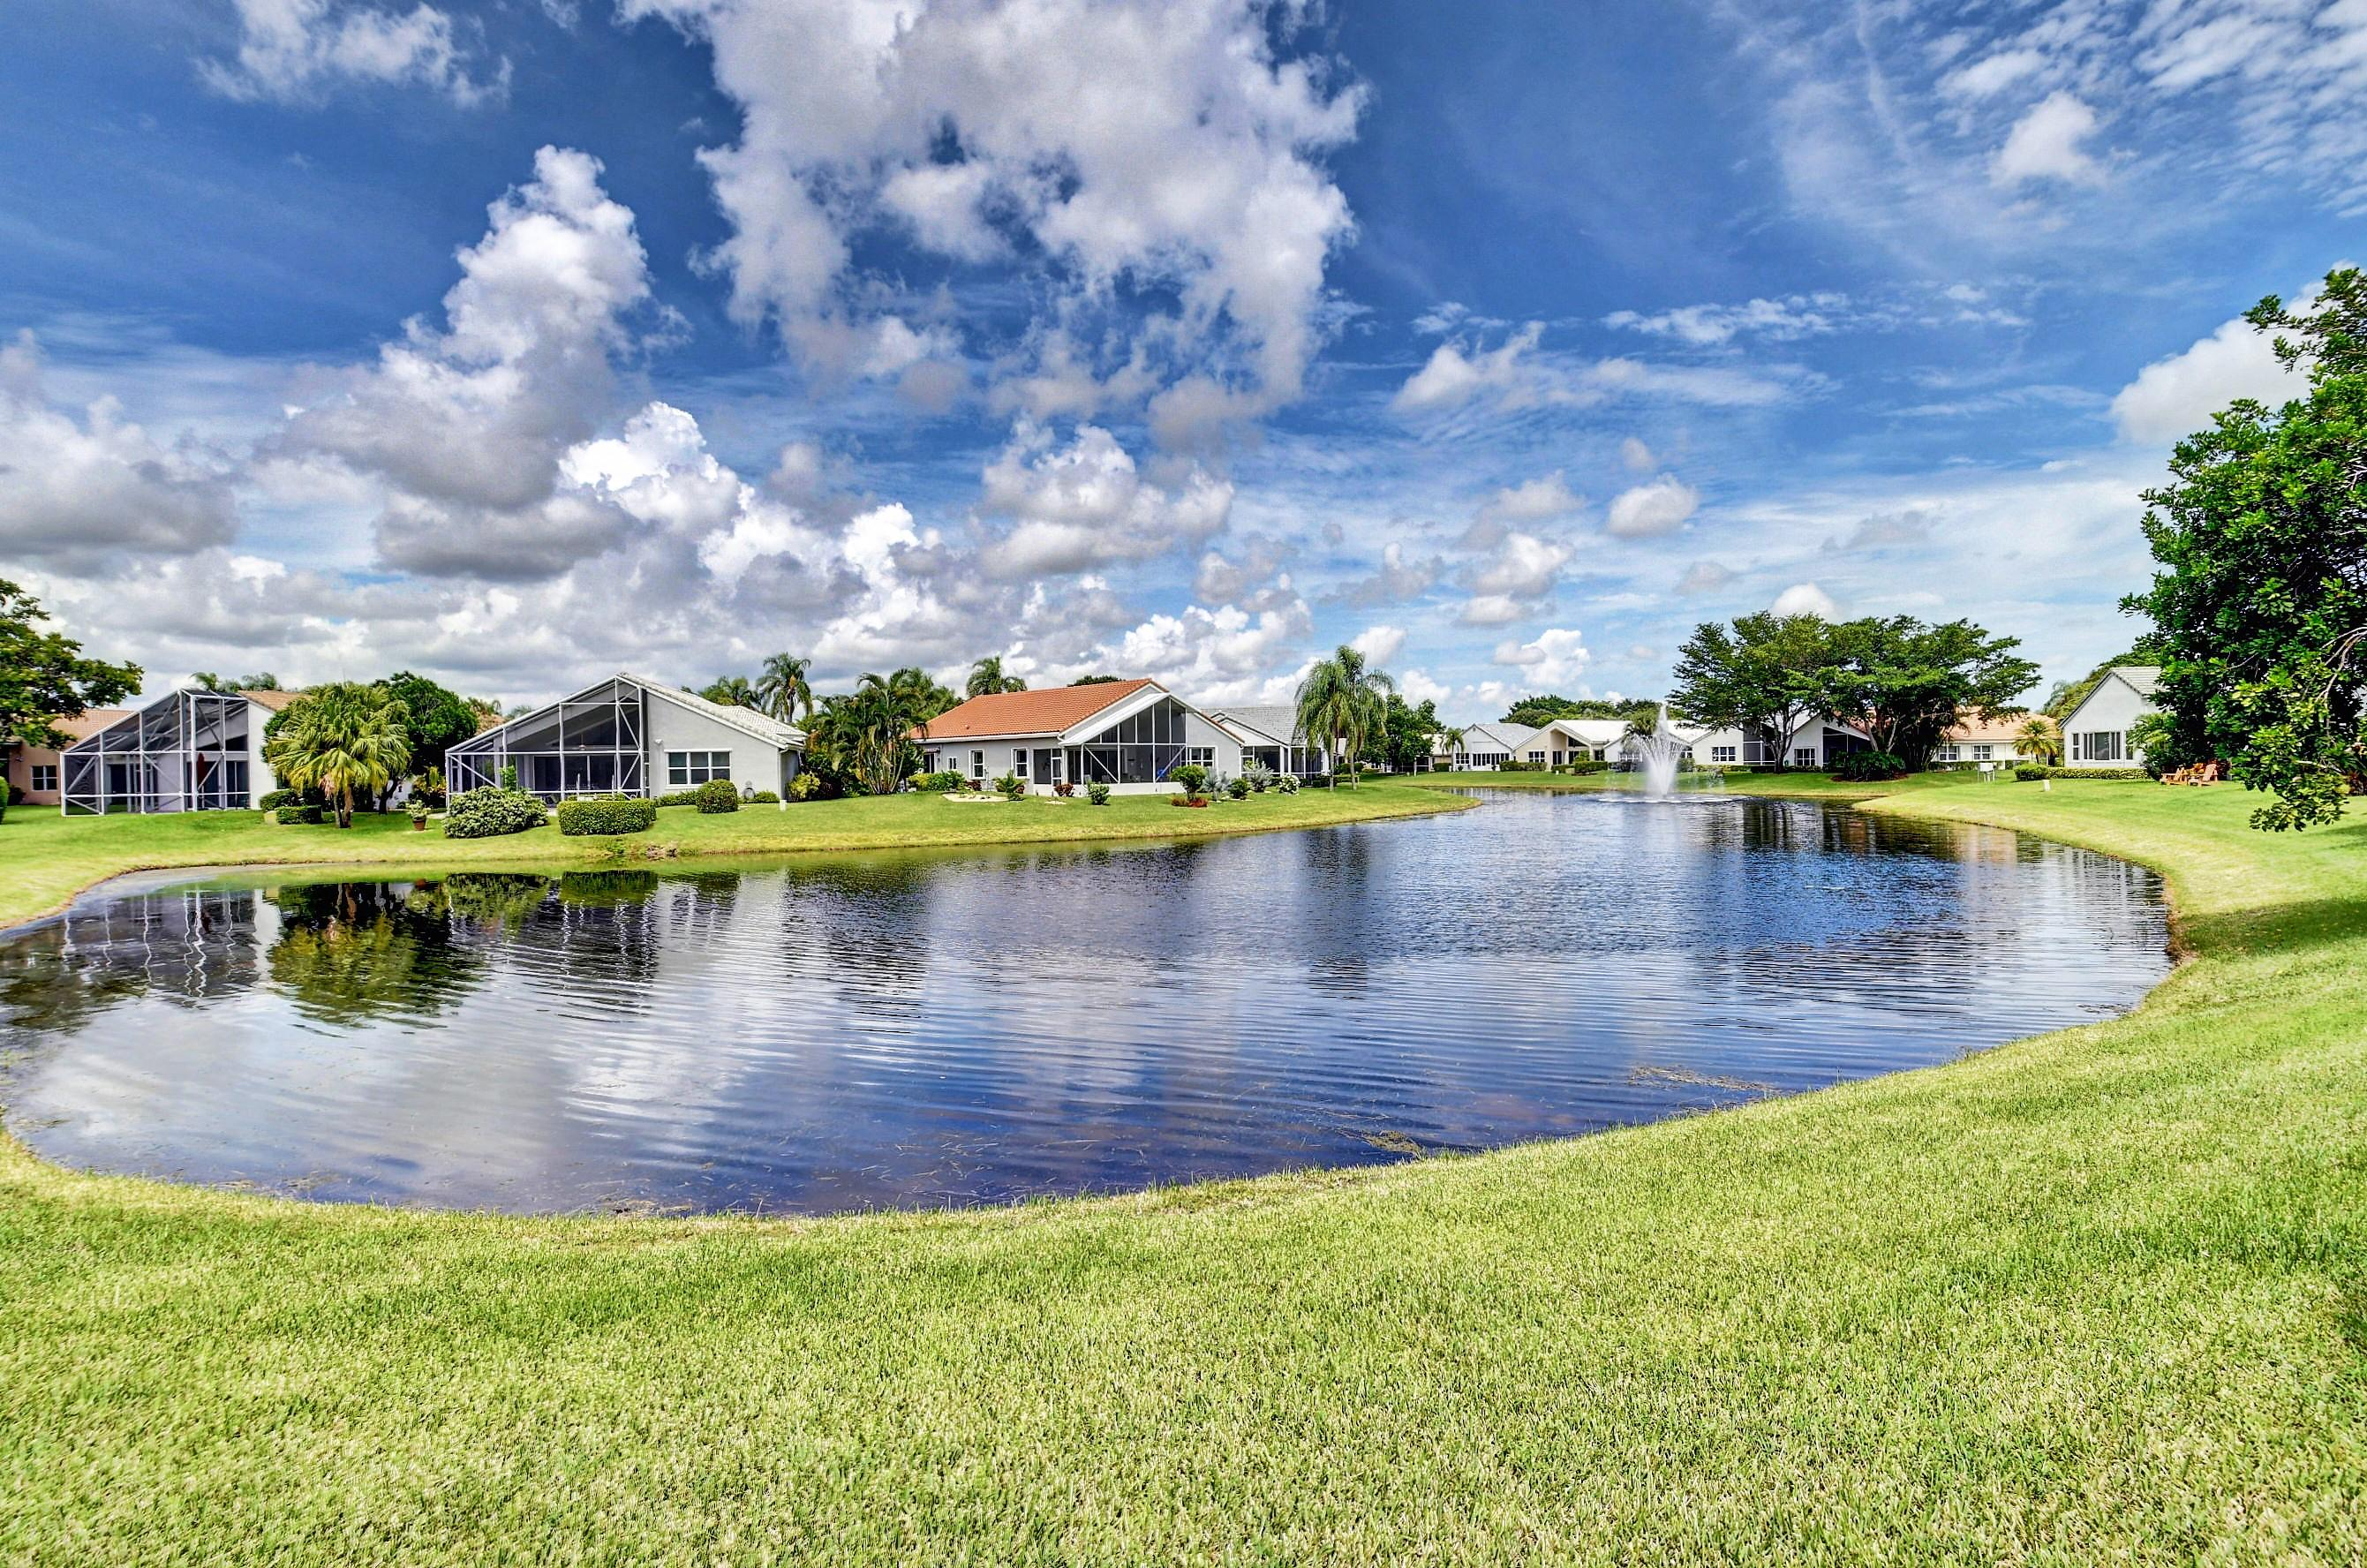 11926 Fountainside Circle, Boynton Beach, FL 33437